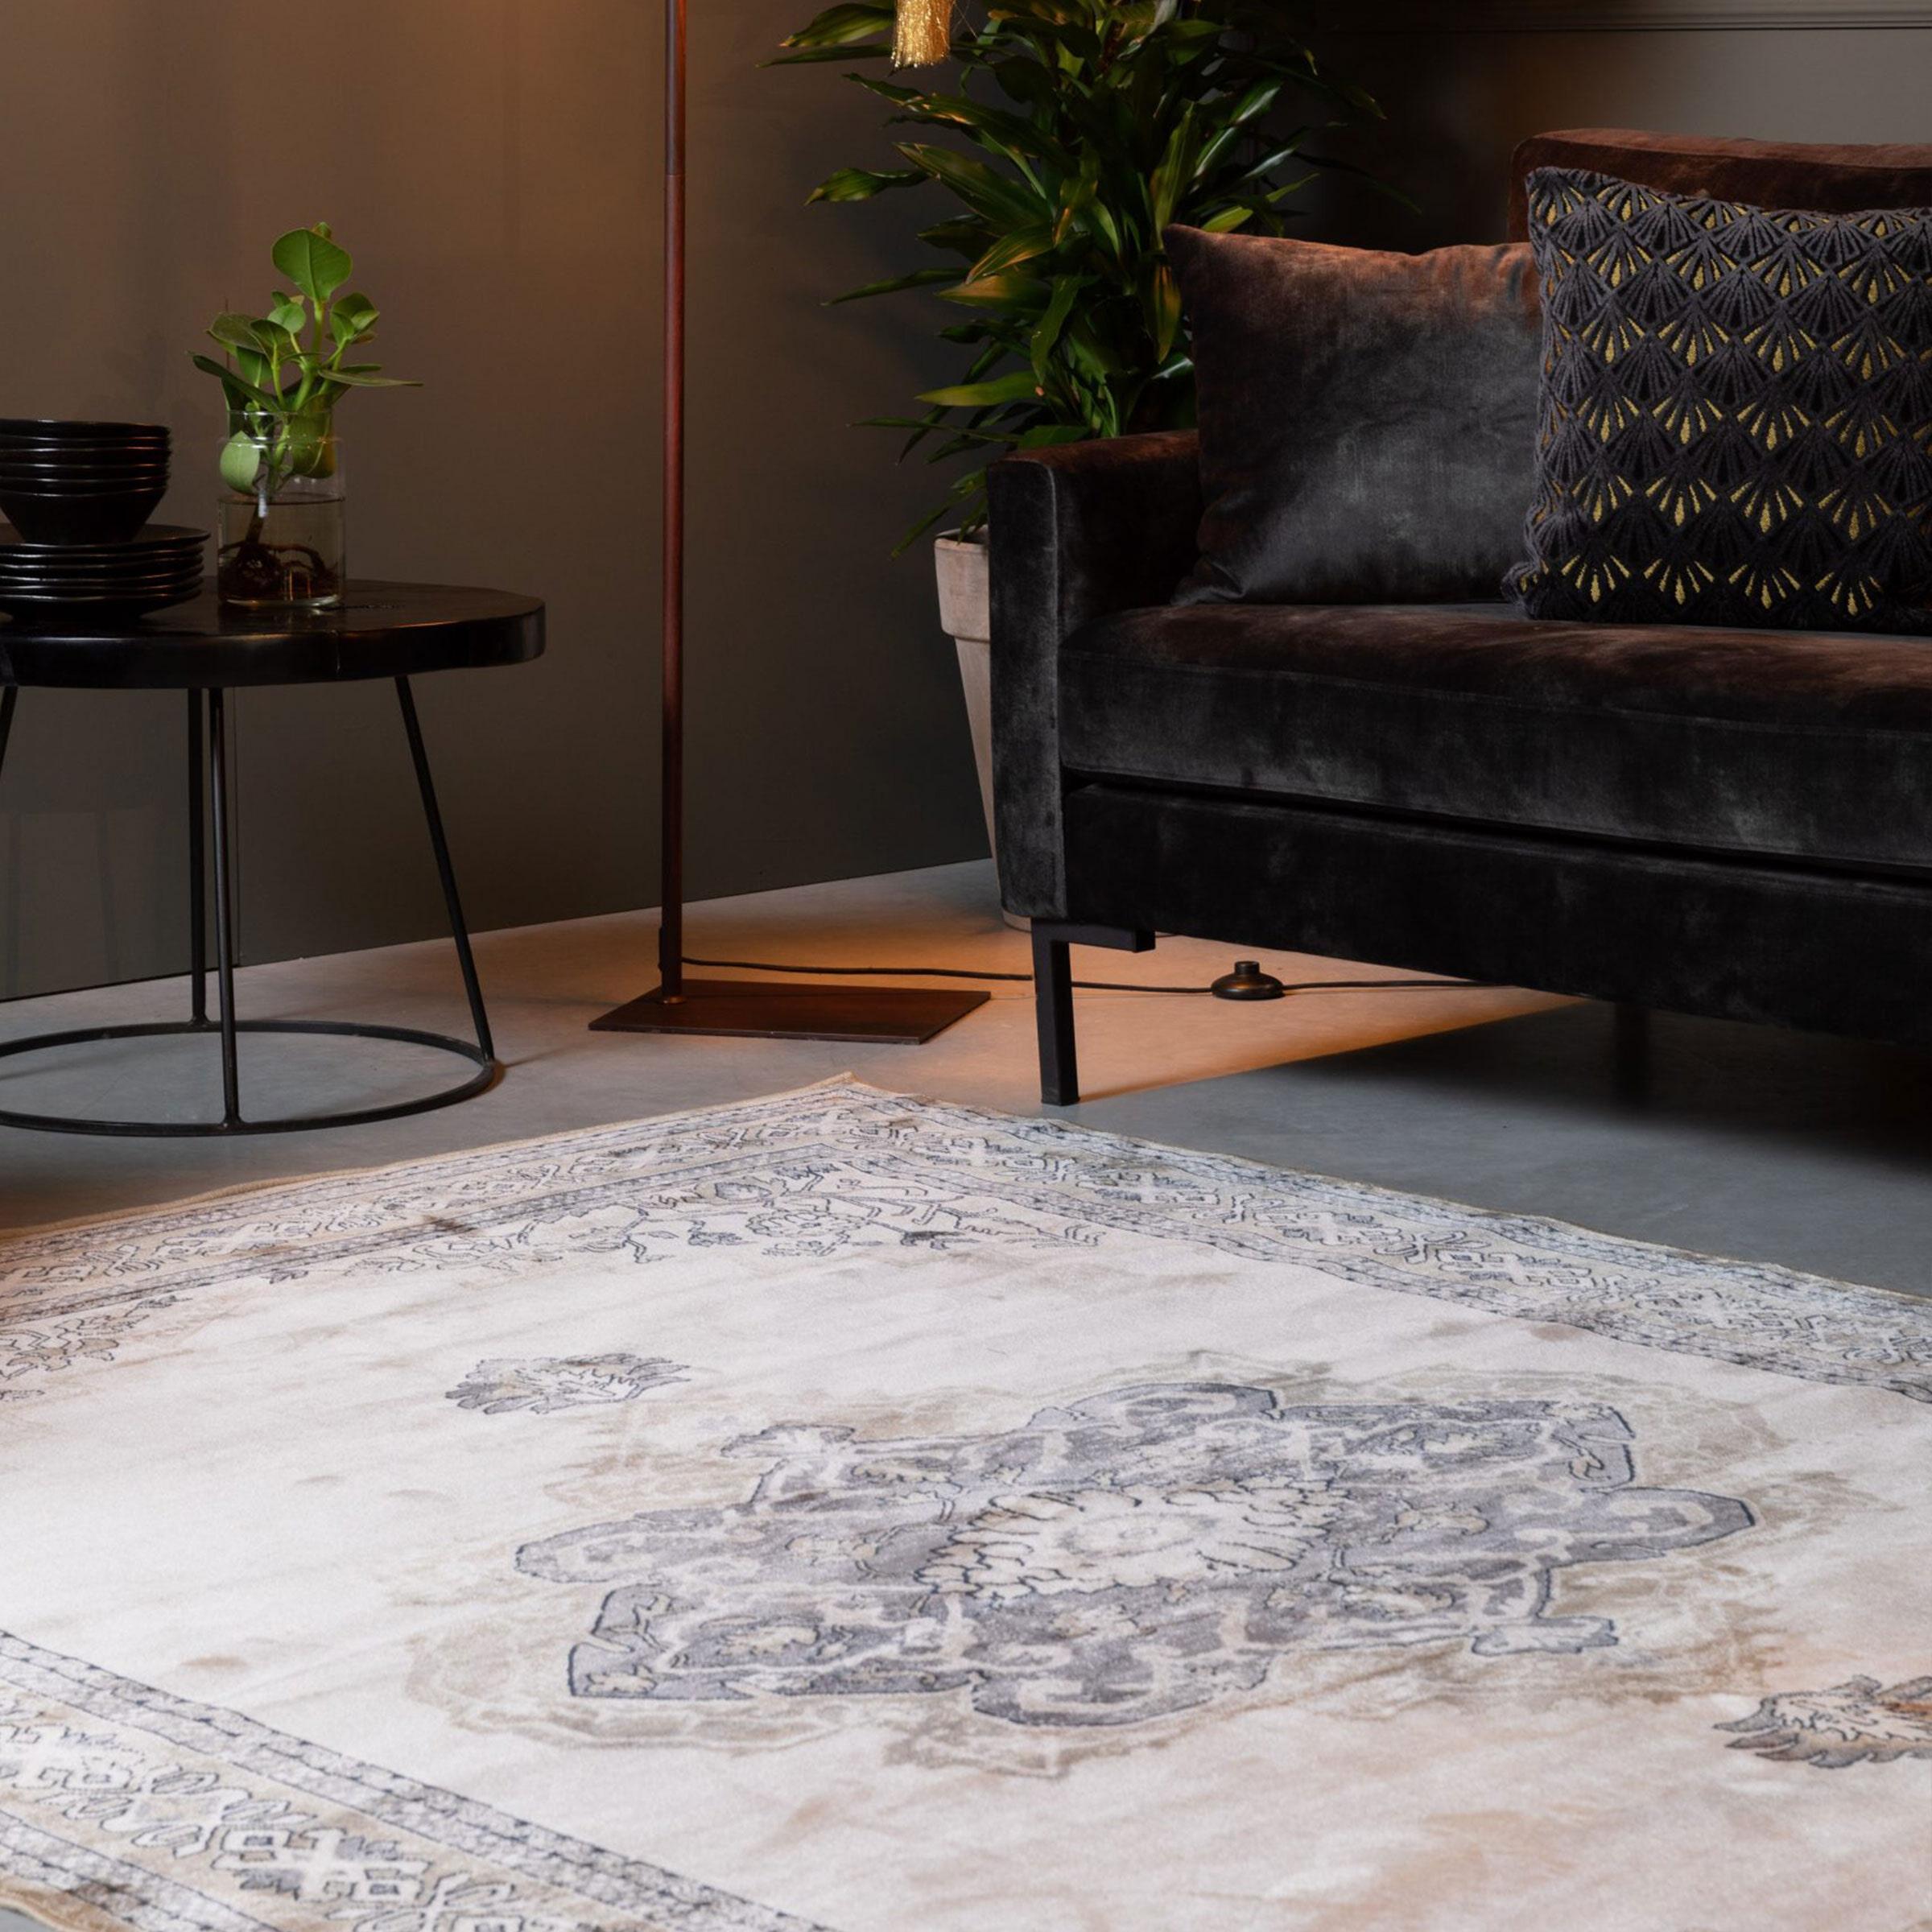 Dutchbone Vloerkleed 'Mahal' 170 x 240cm, kleur Grey/Liver